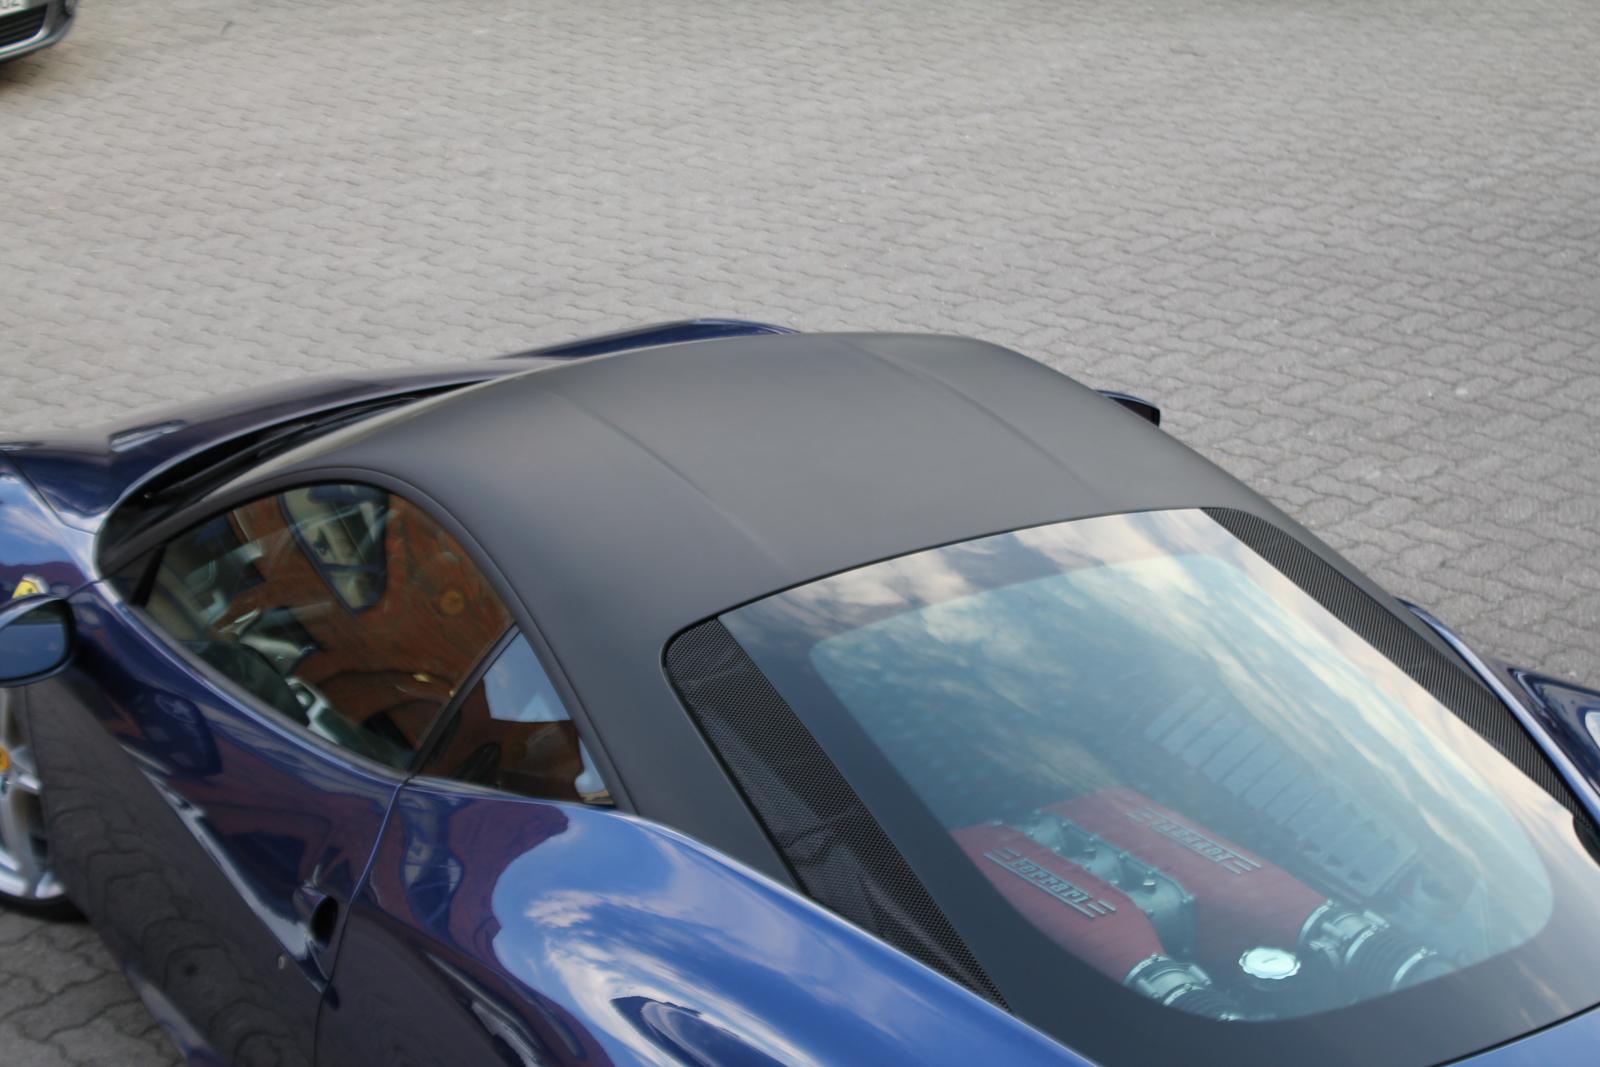 Car Wrapping Auto Folierung Ferrari 458 Italia Dachfolierung Schmarz Matt